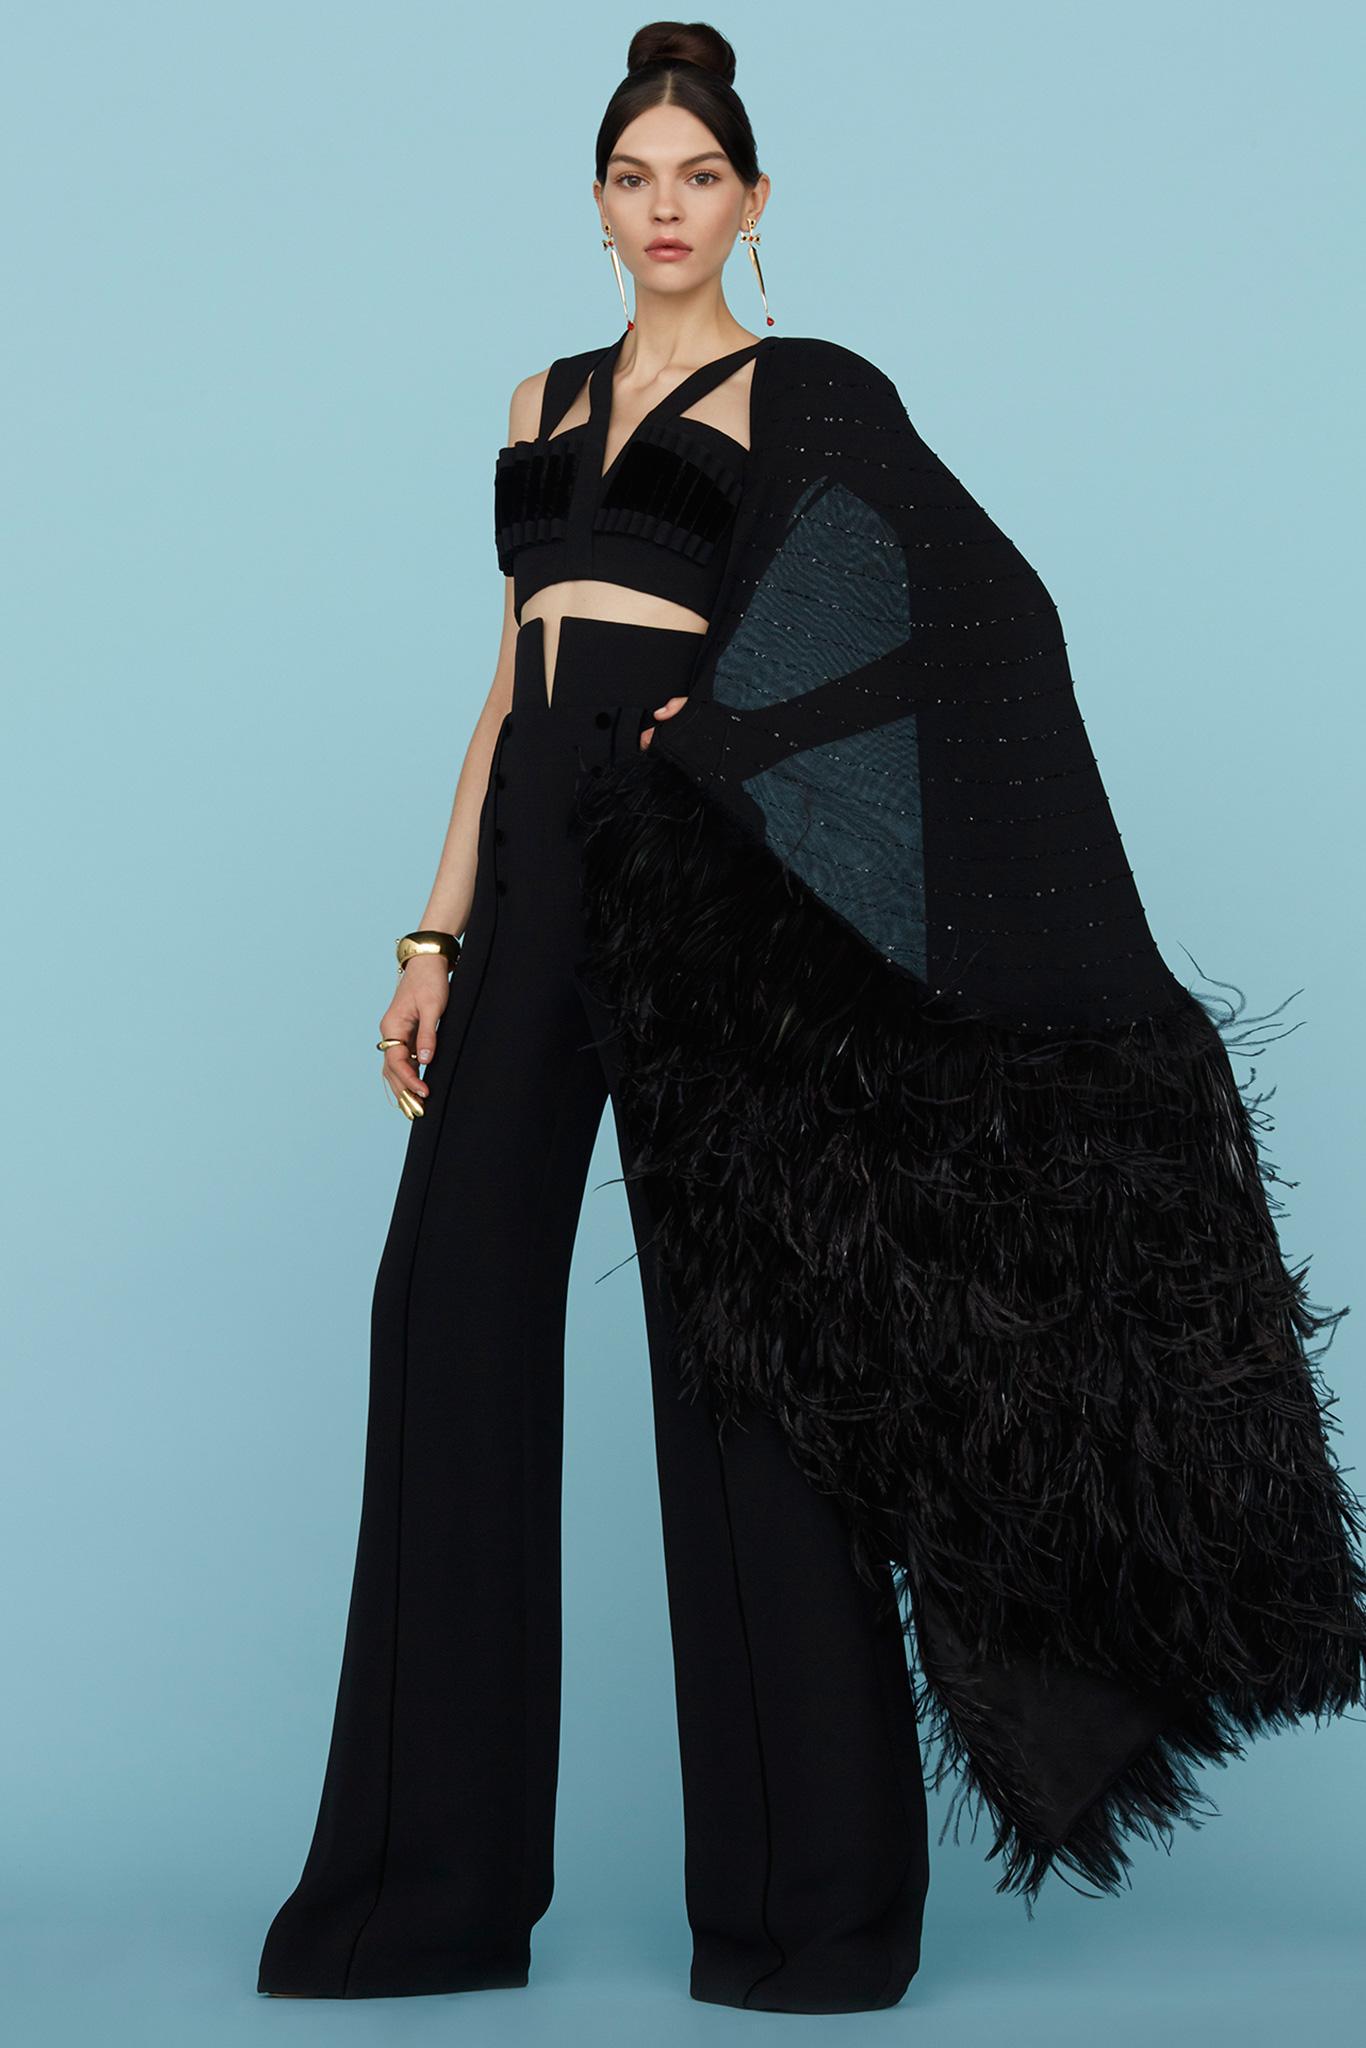 Ulyana Sergeenko Haute Couture 2015 Самые носибельные образы с Недели моды haute couture в Париже